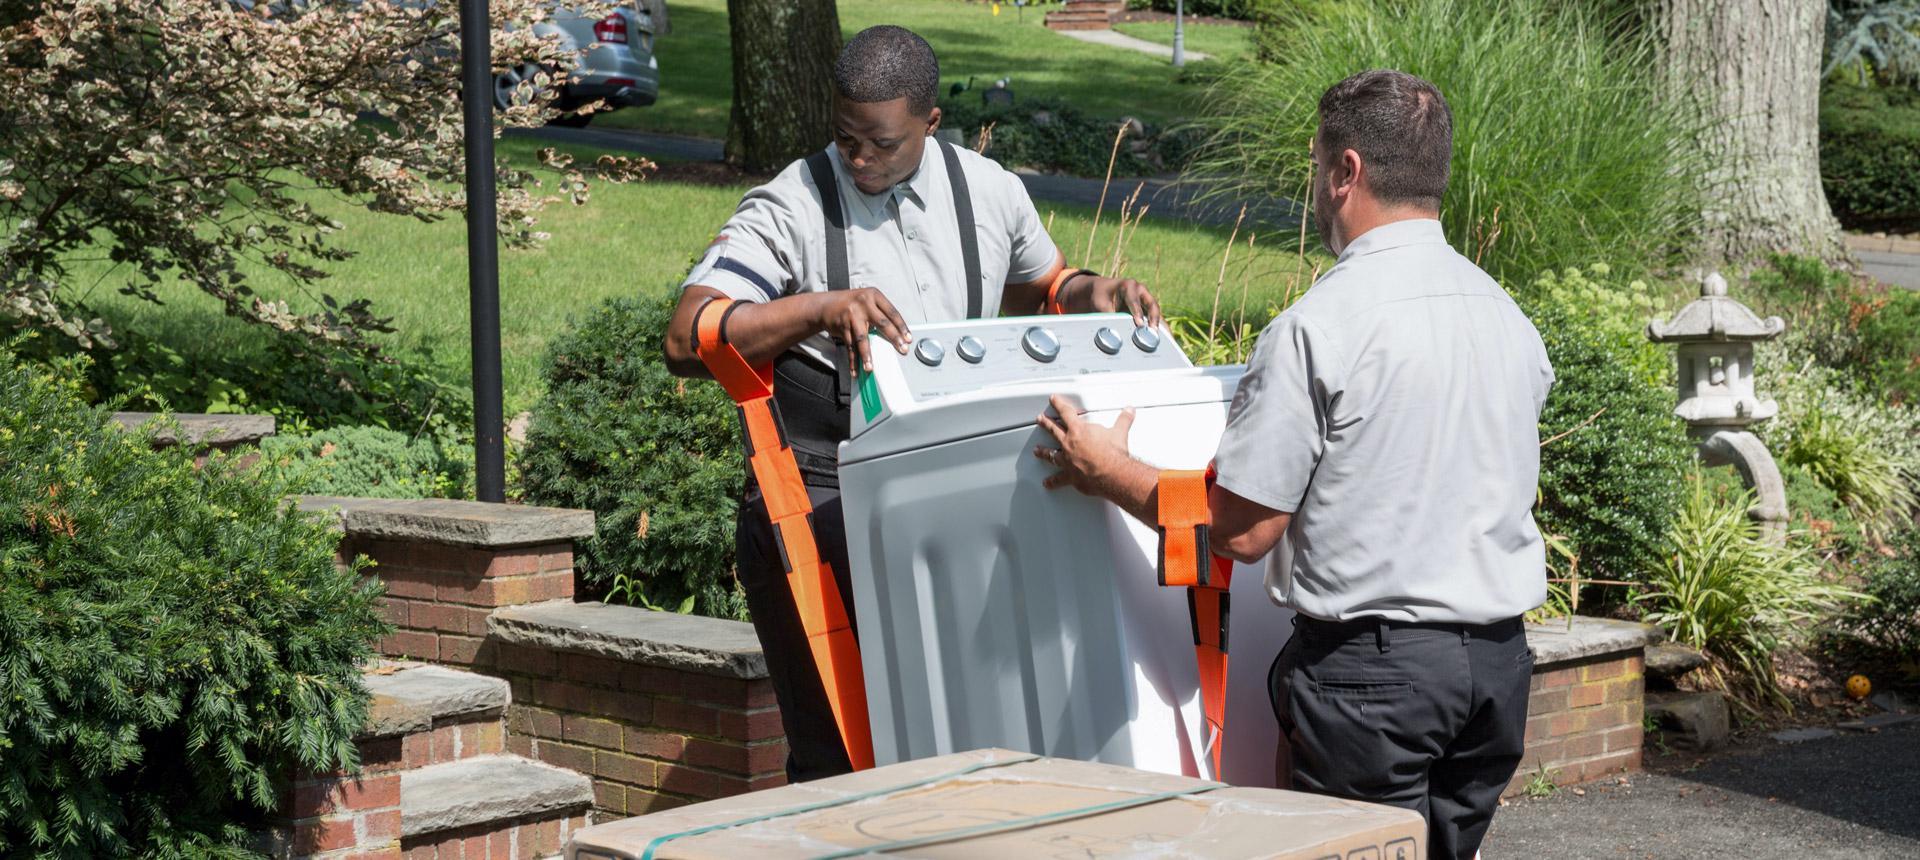 Two men handling an appliance